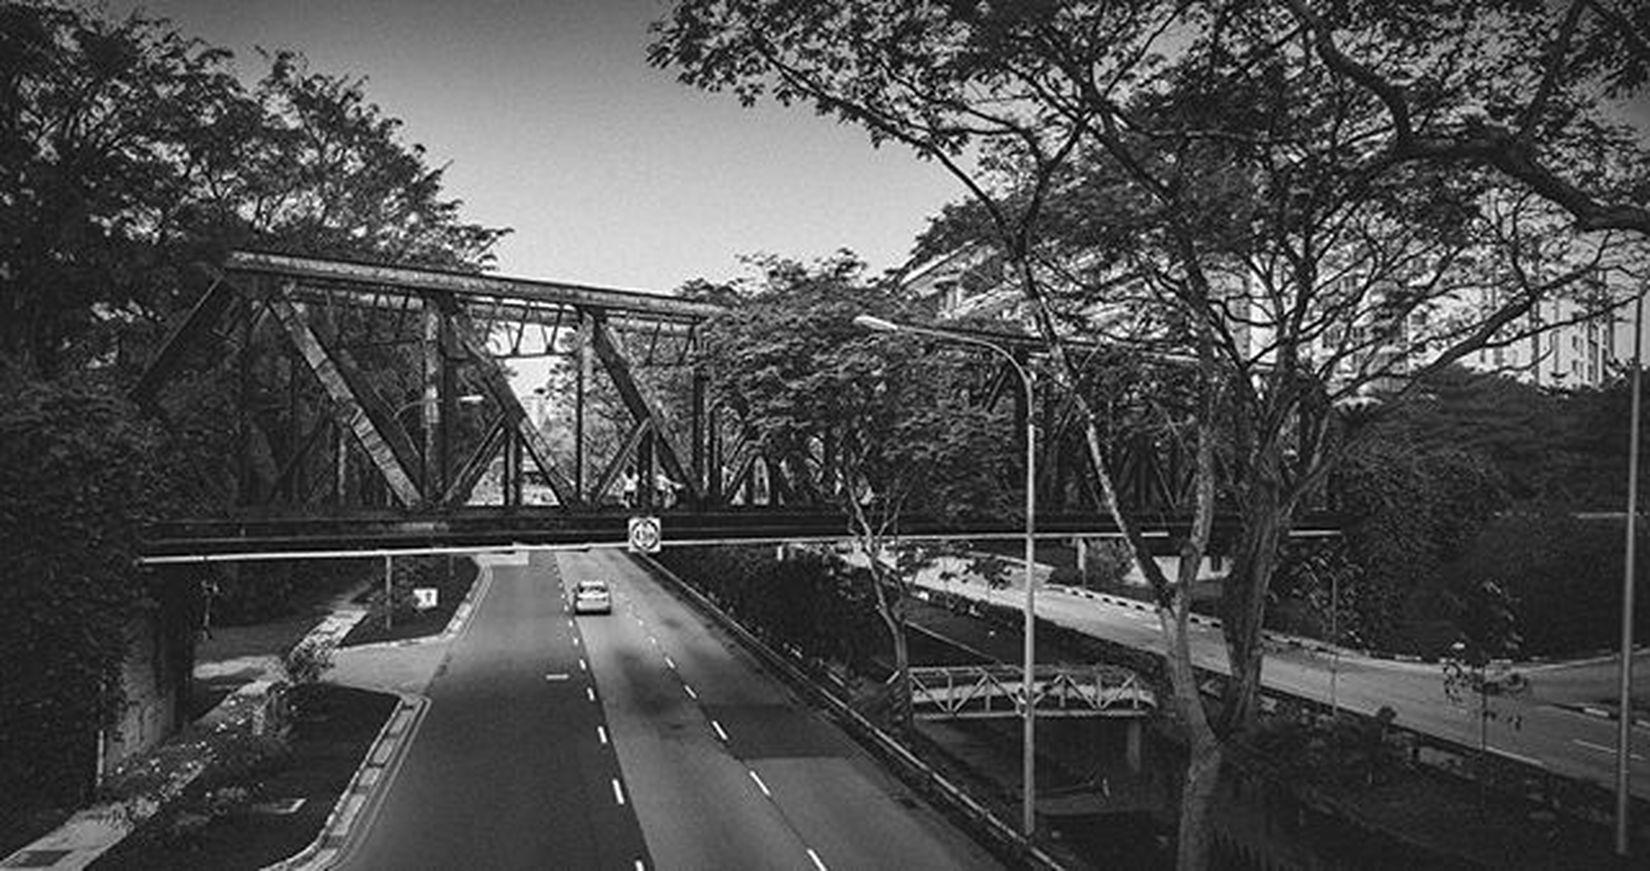 Iconic Bukit Timah Railway Bridge from back in the day Singapore ASIA Landscape Railways Lightroom Bukittimah